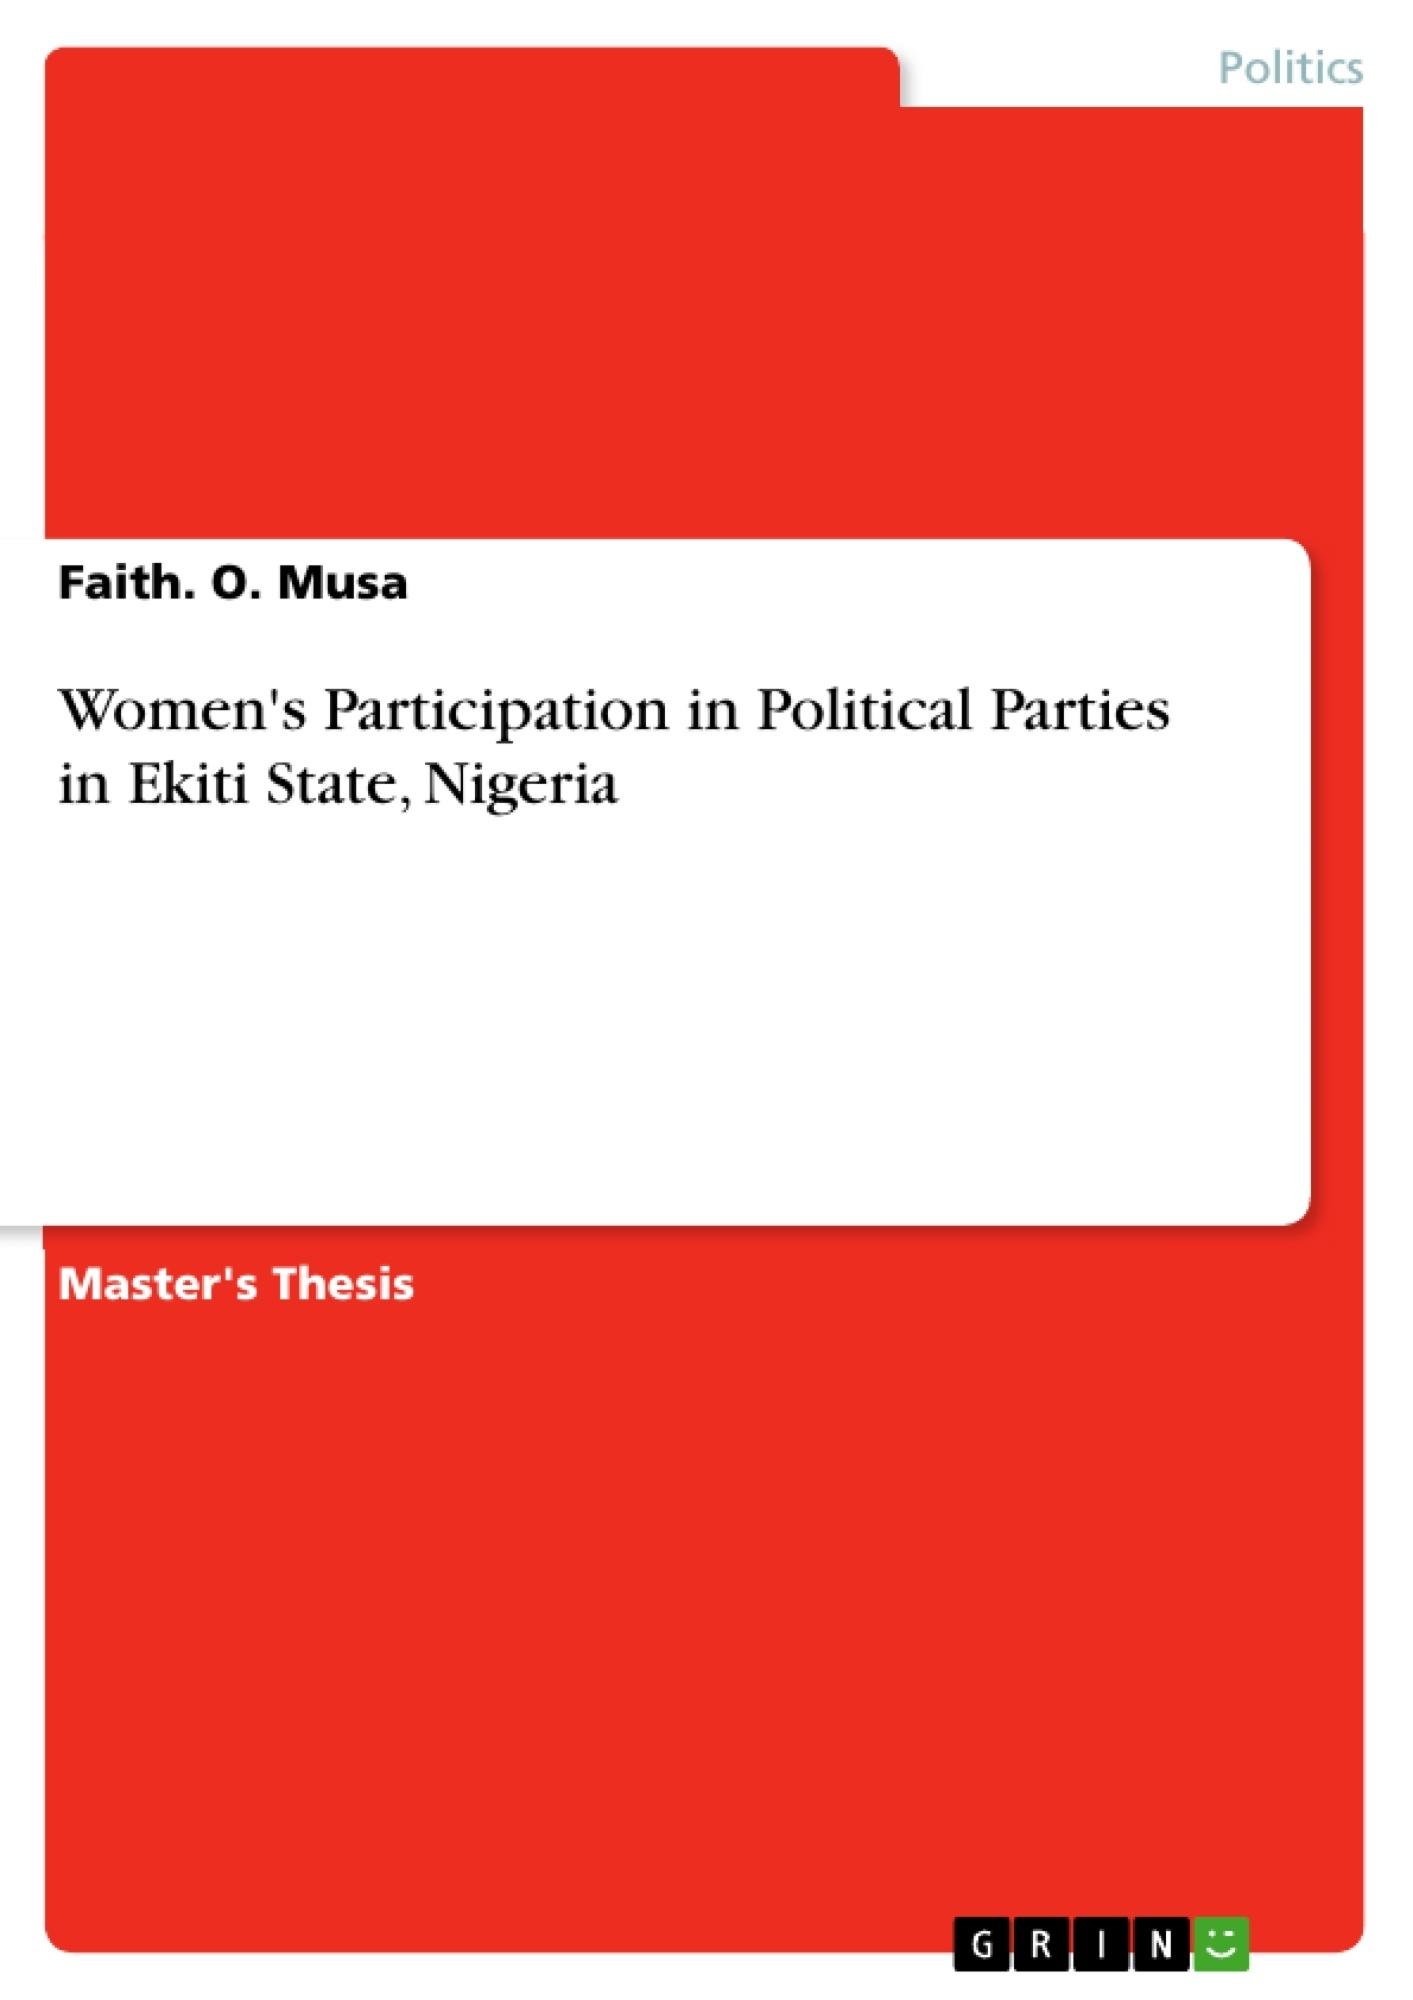 Title: Women's Participation in Political Parties in Ekiti State, Nigeria